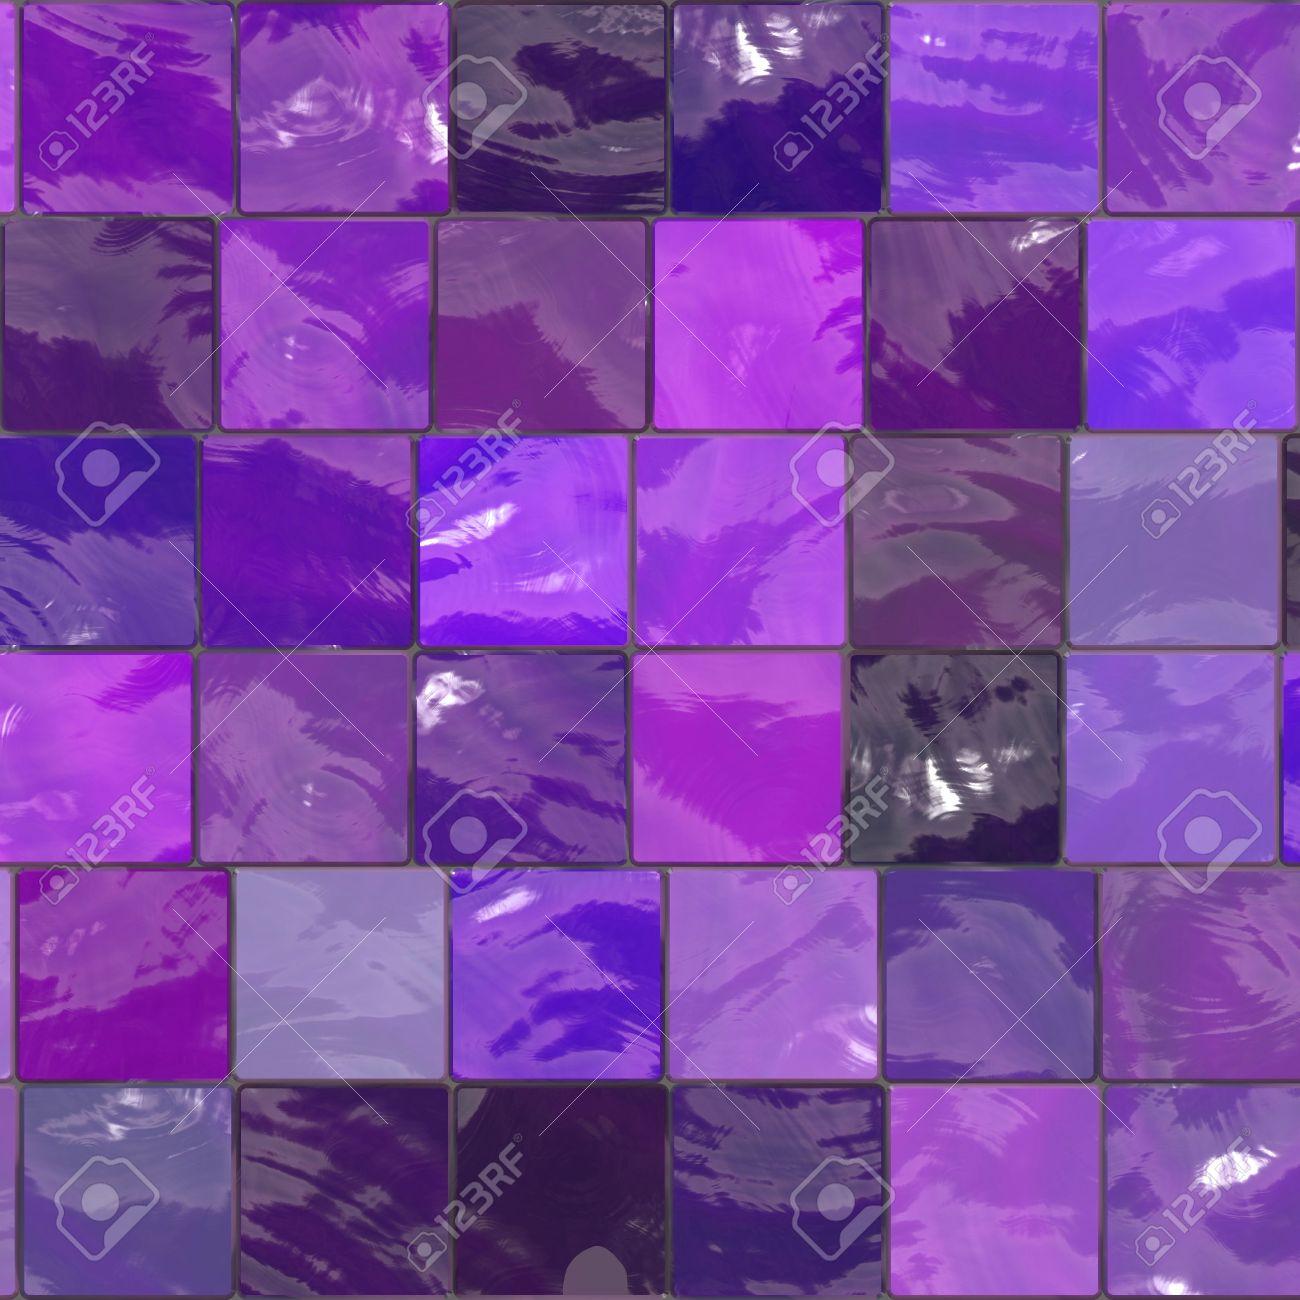 archivio fotografico porpora bagno mosaico piastrelle texture